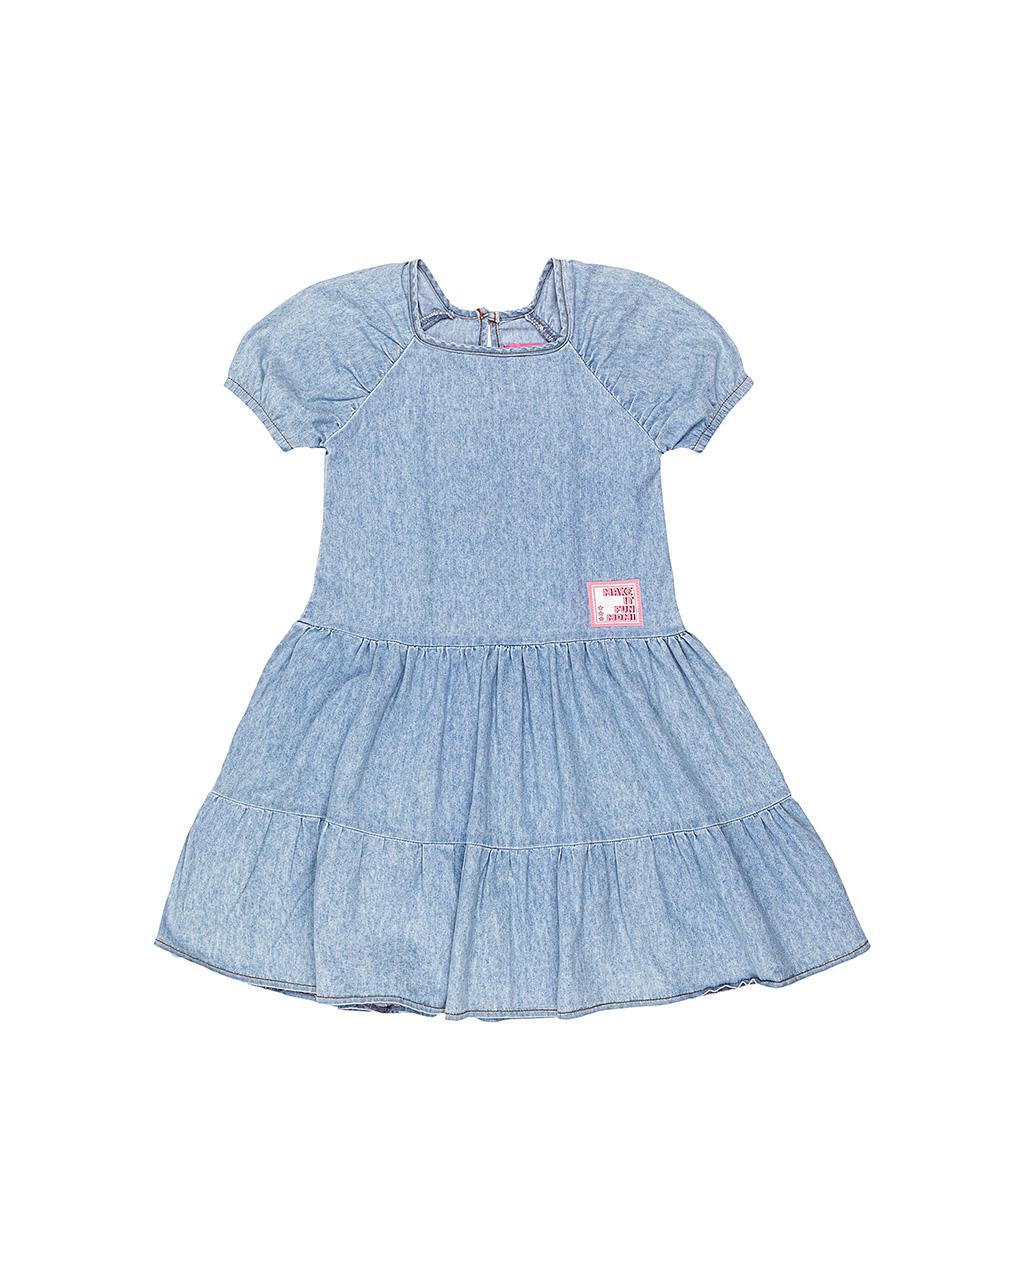 Vestido Infantil Jeans Recortes Momi